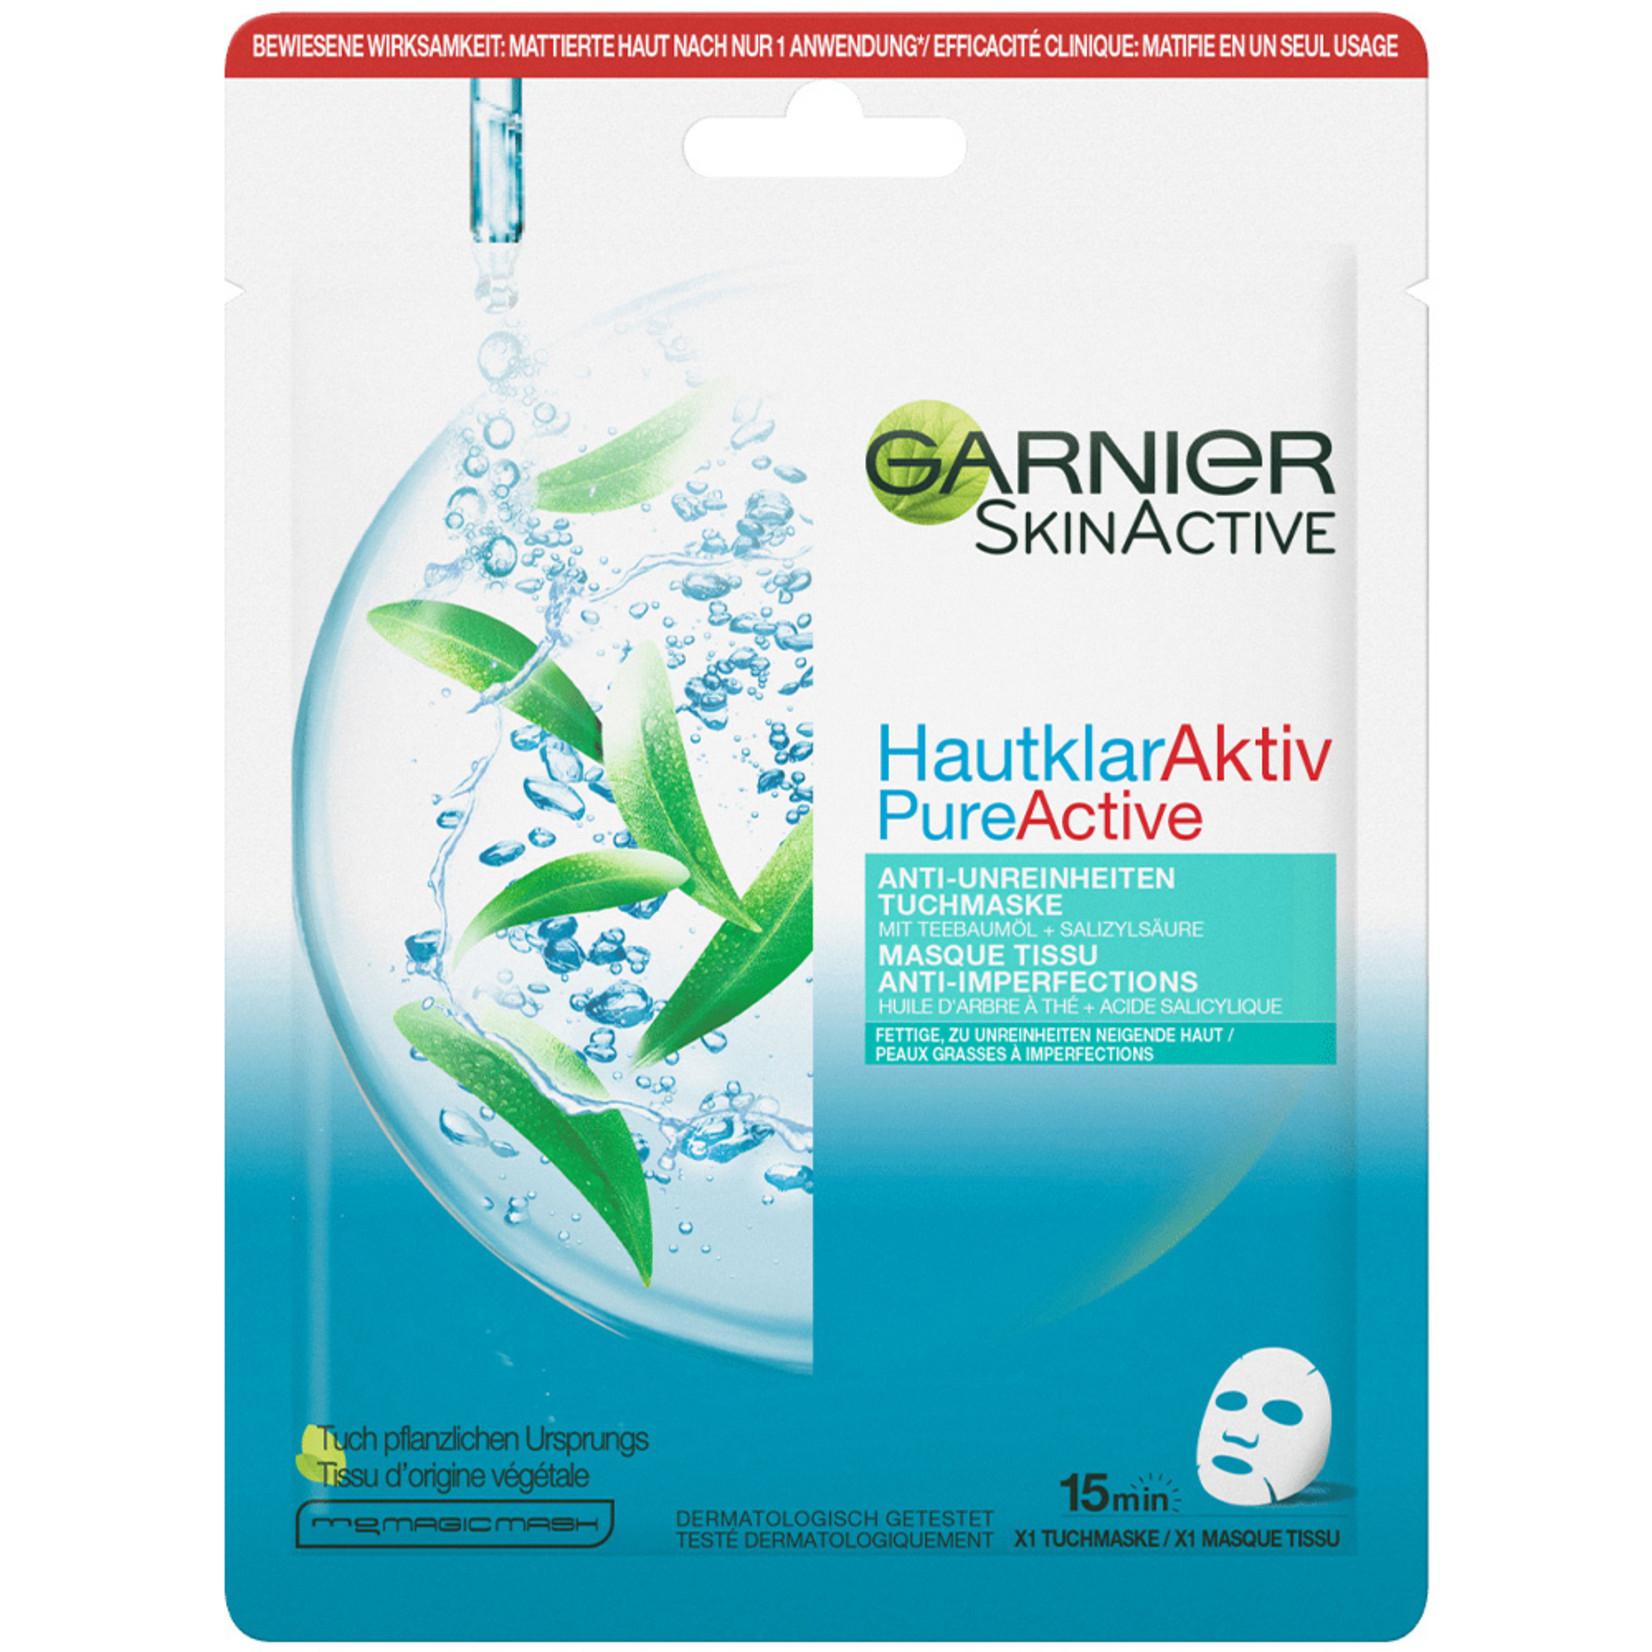 Garnier SkinActive PureActive Sheet Mask